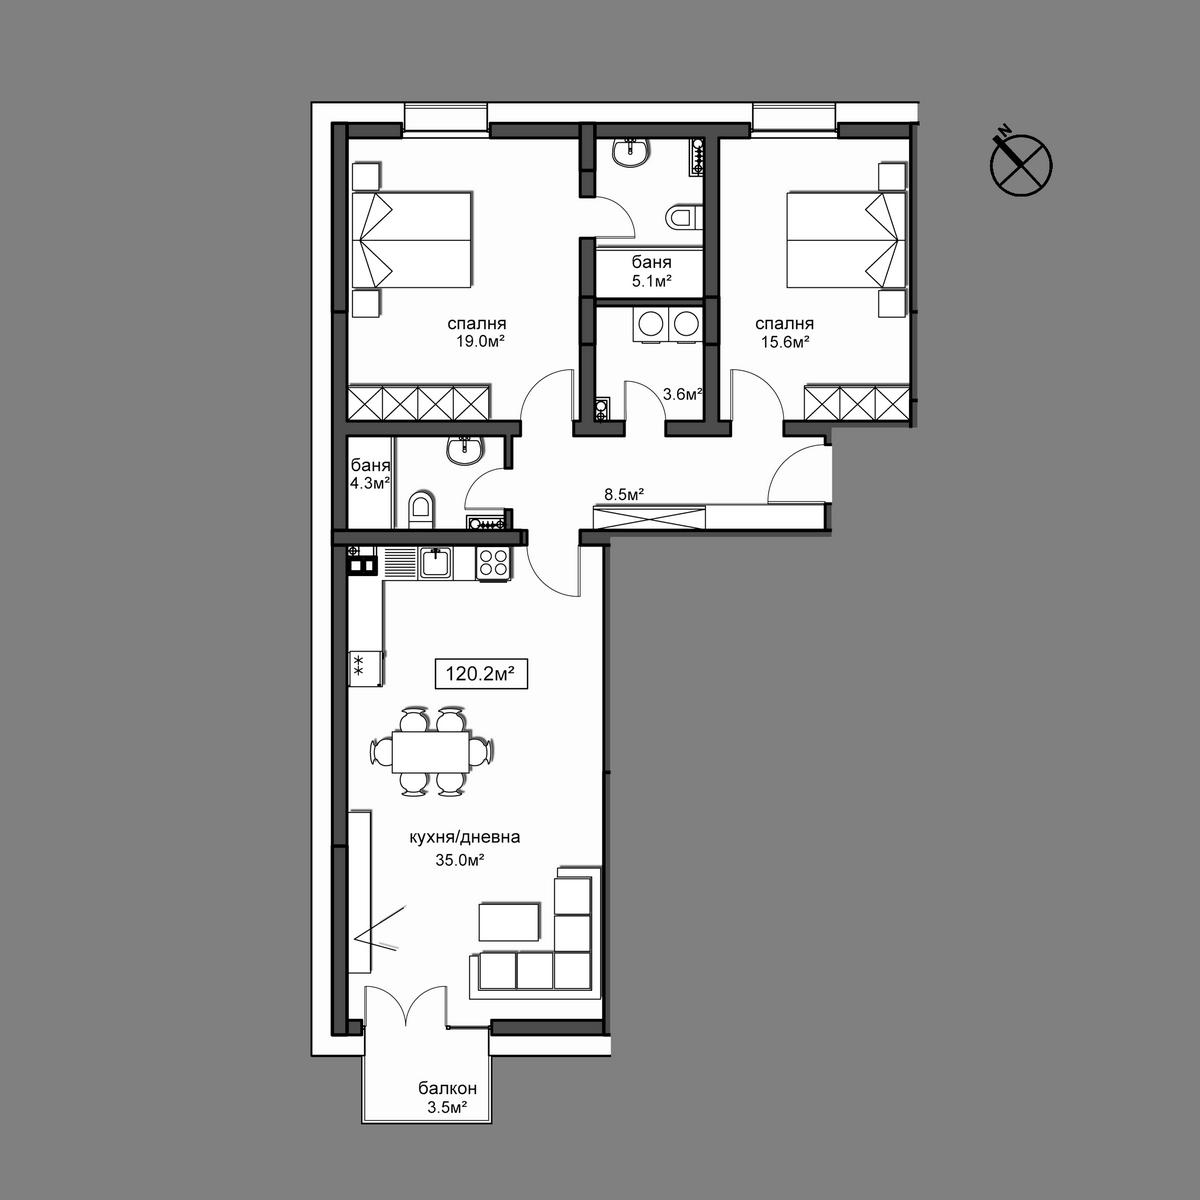 Продава апартамент ново строителство - Апартамент 5